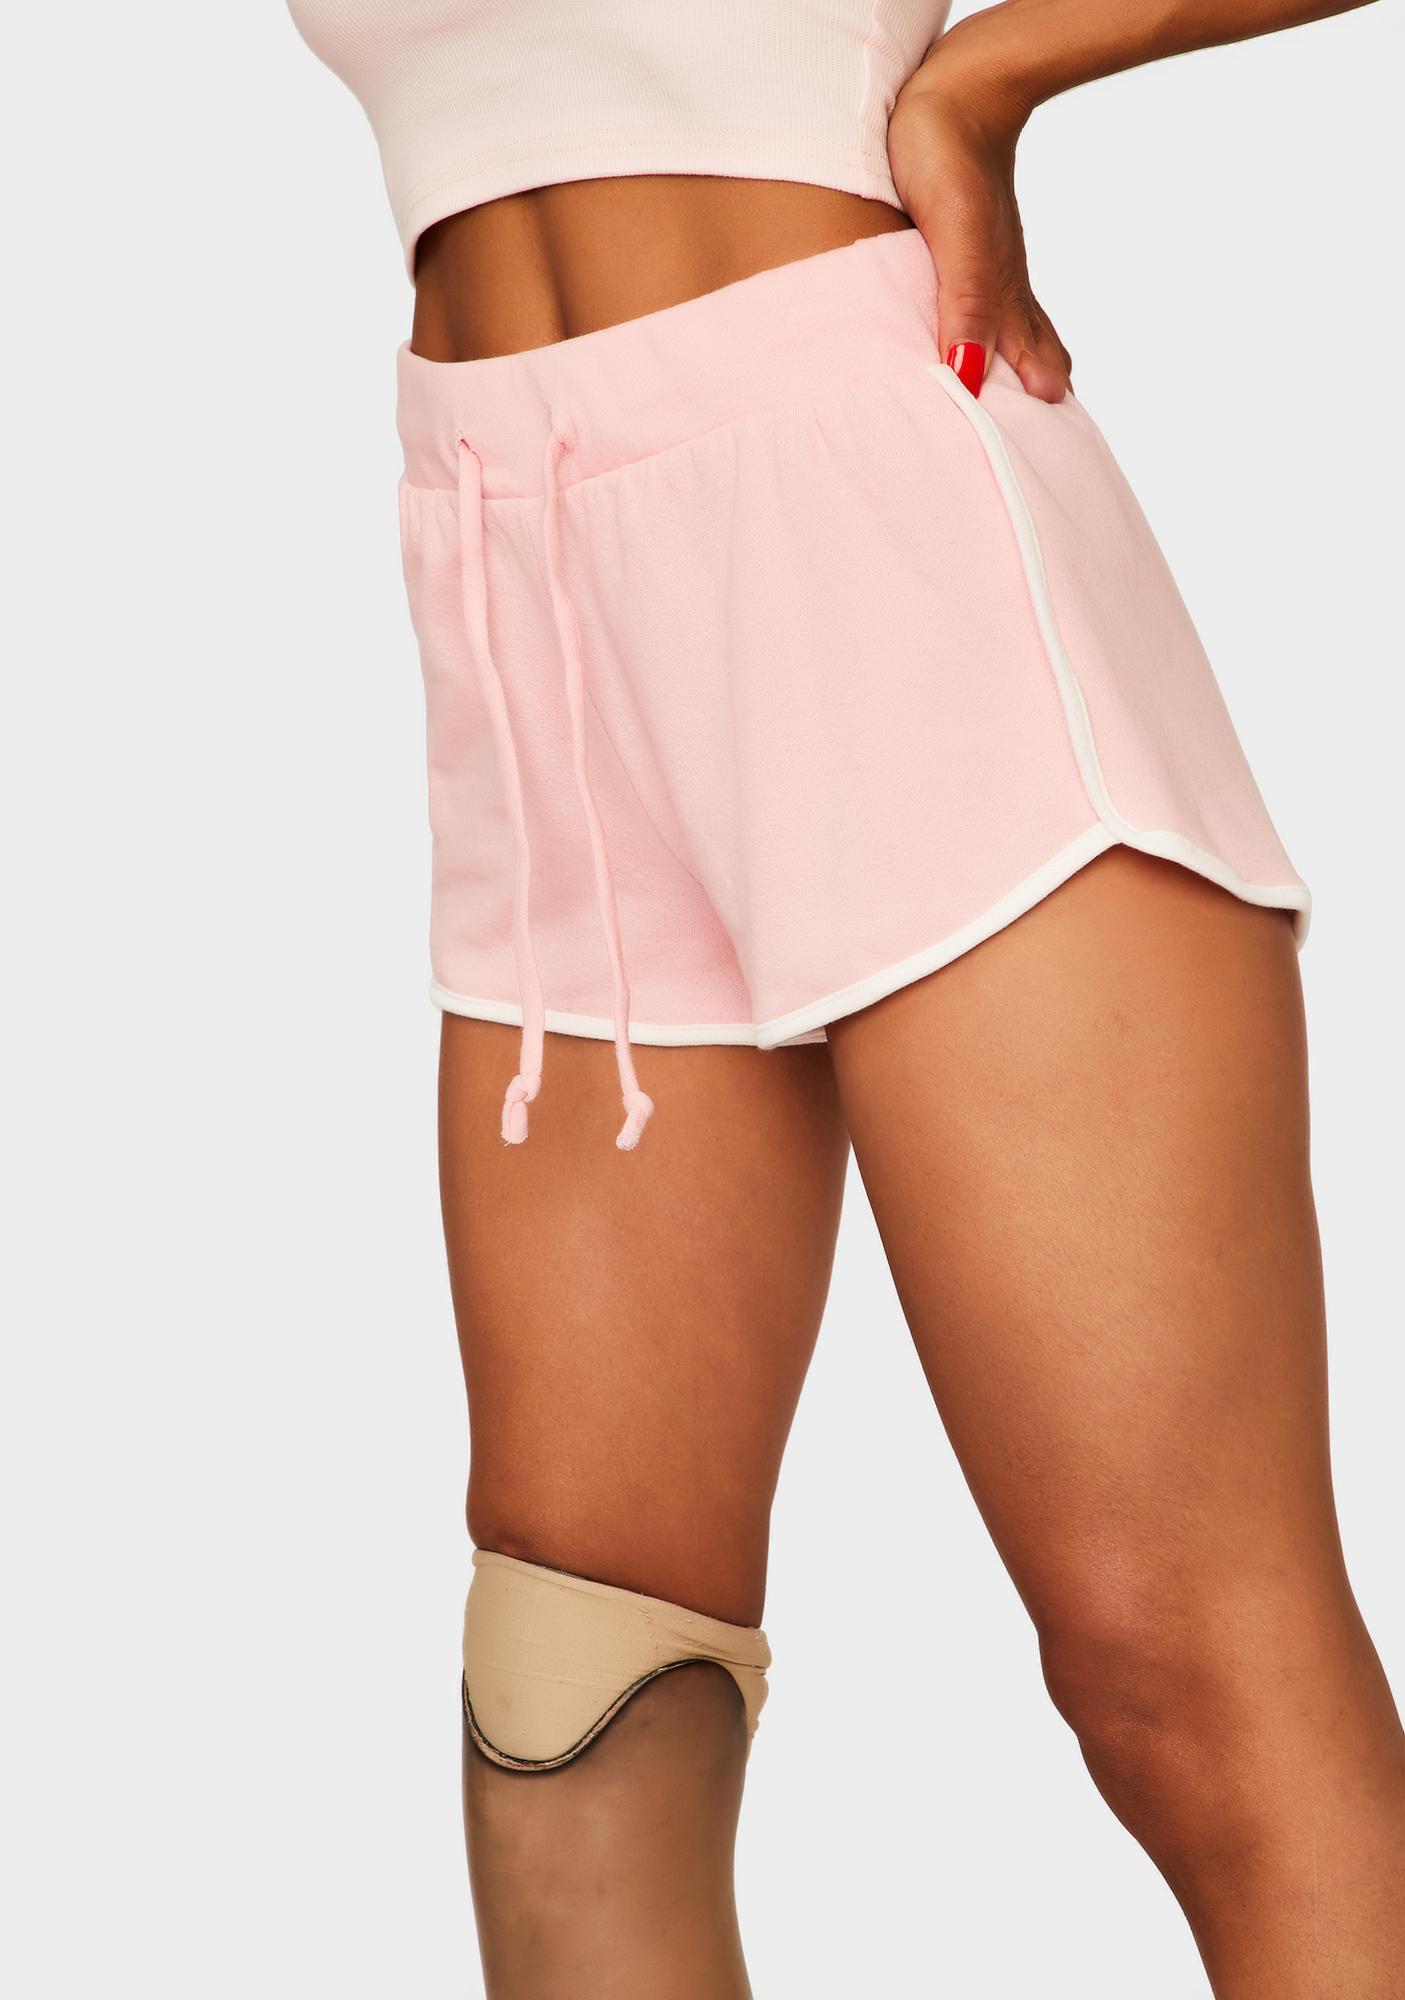 Bae Just Chillin' Dolphin Shorts